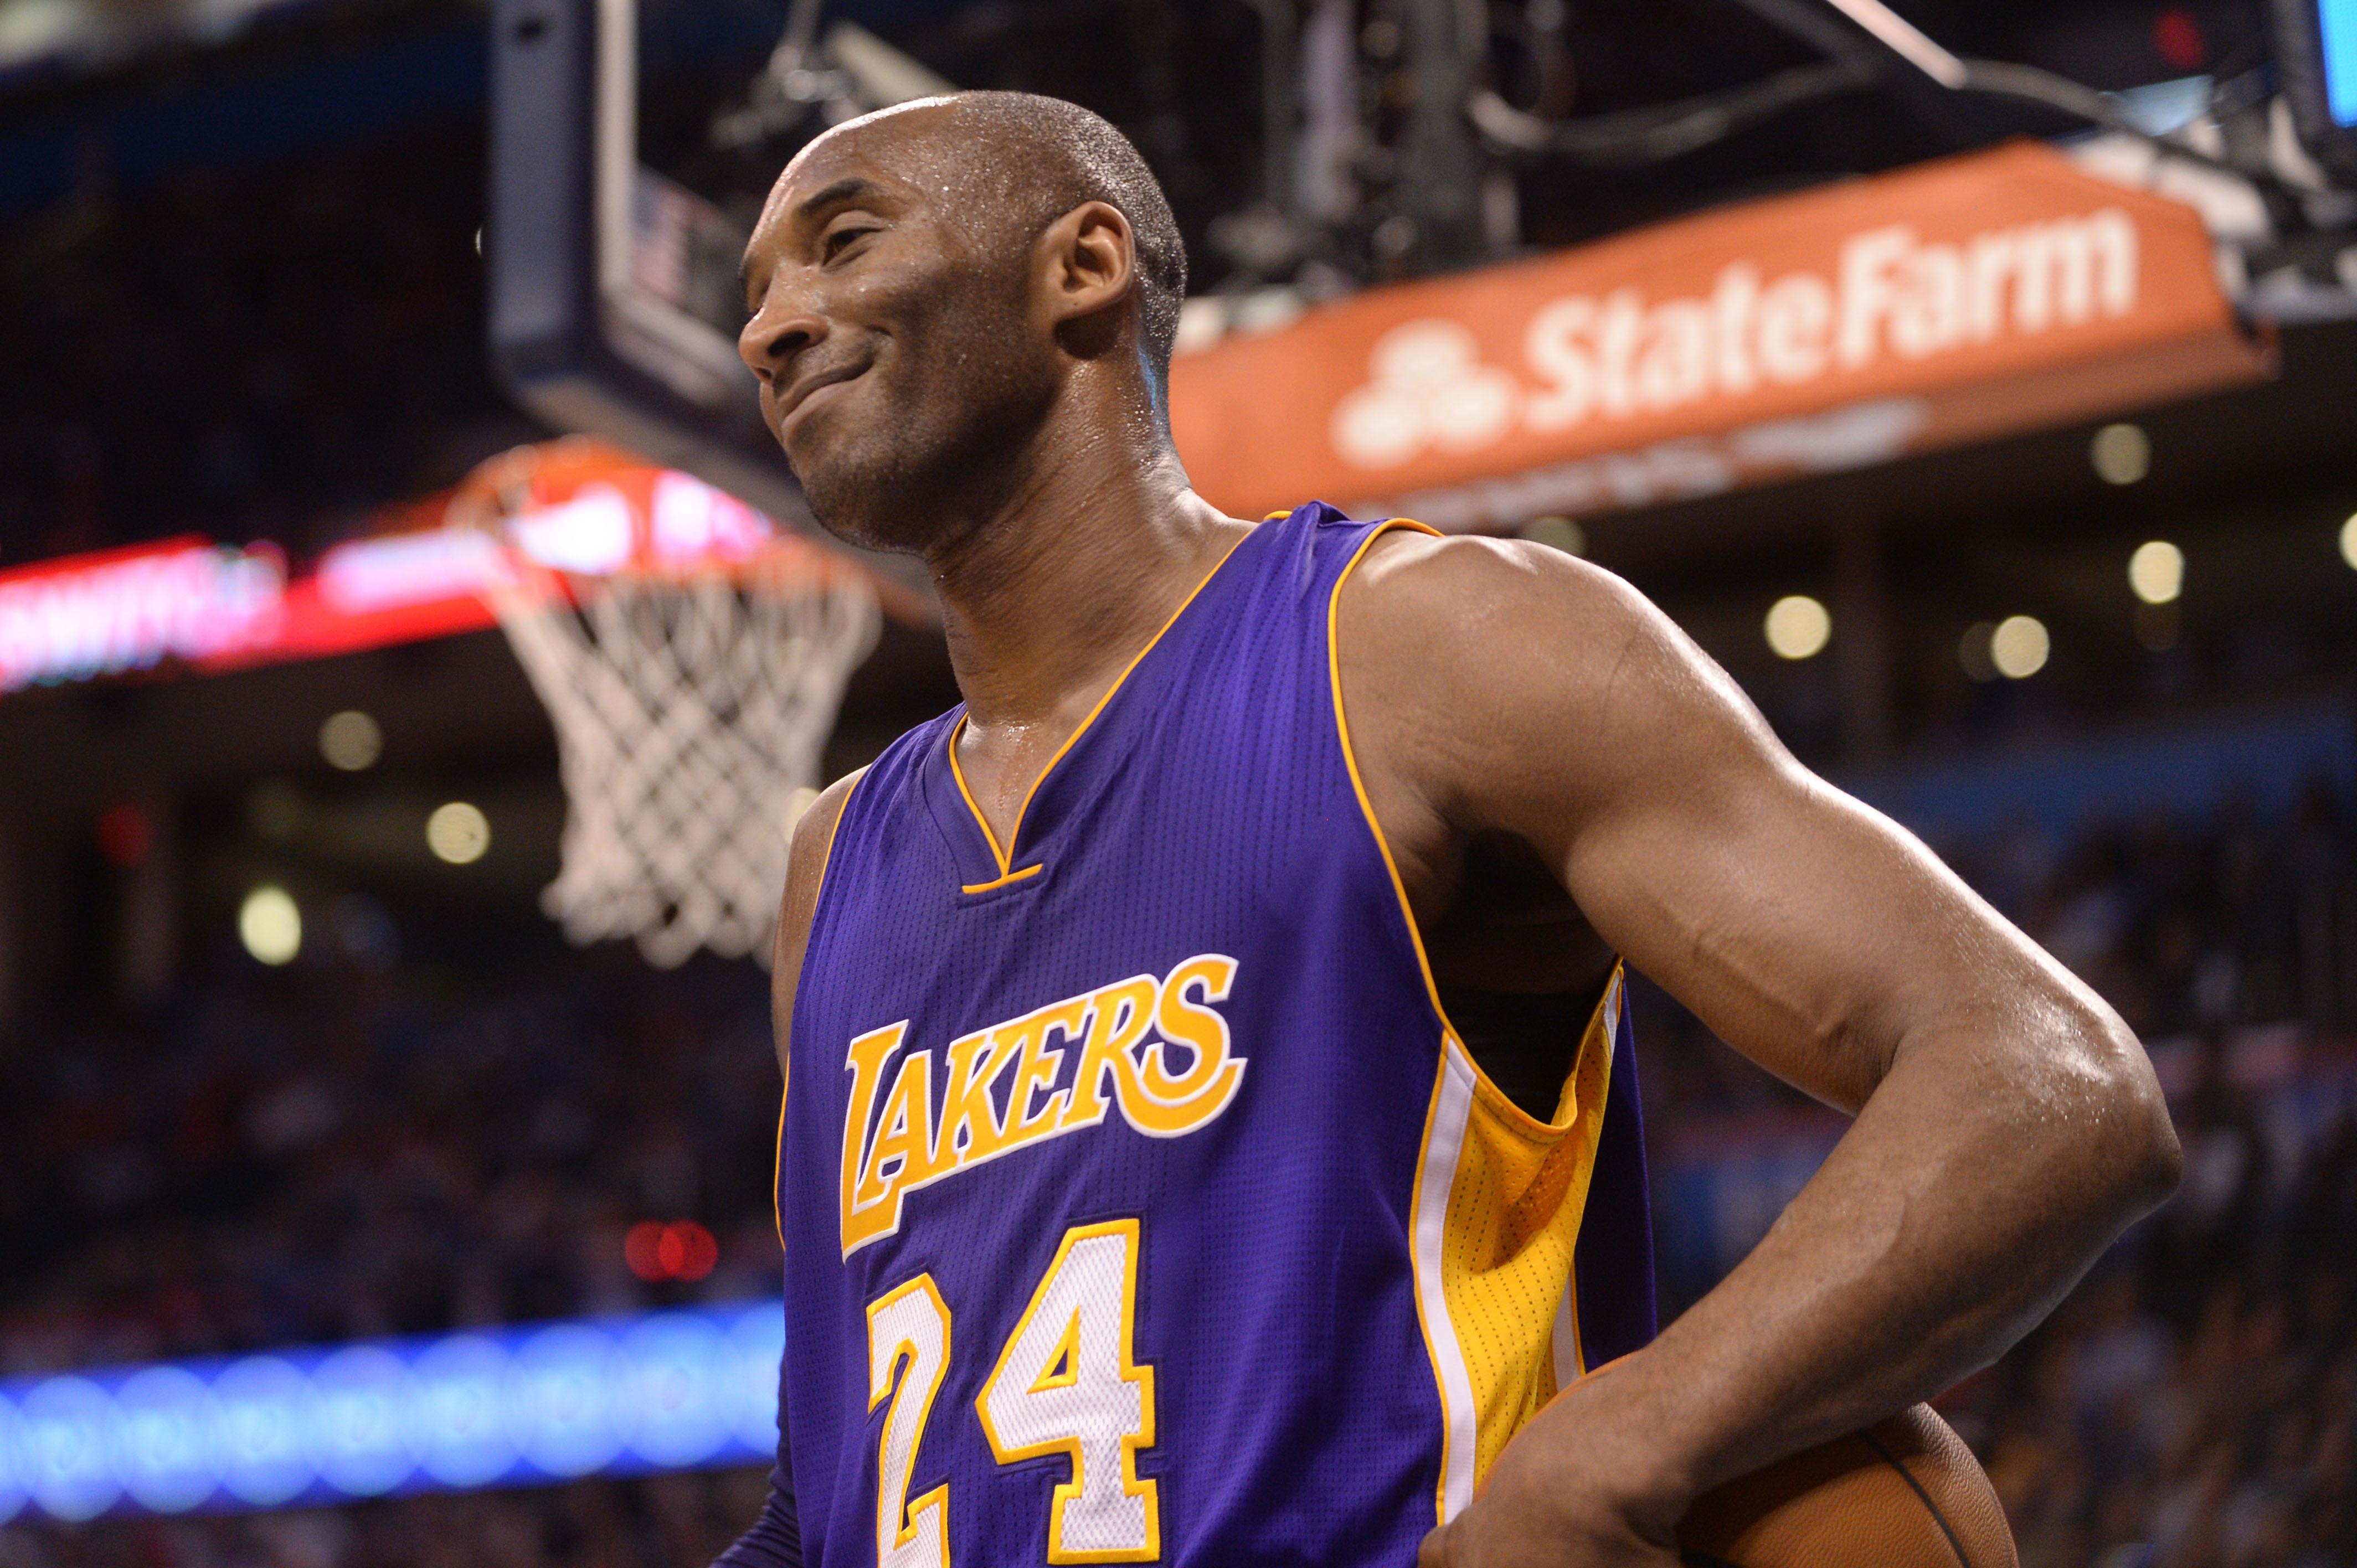 30 best shots in NBA Playoffs history